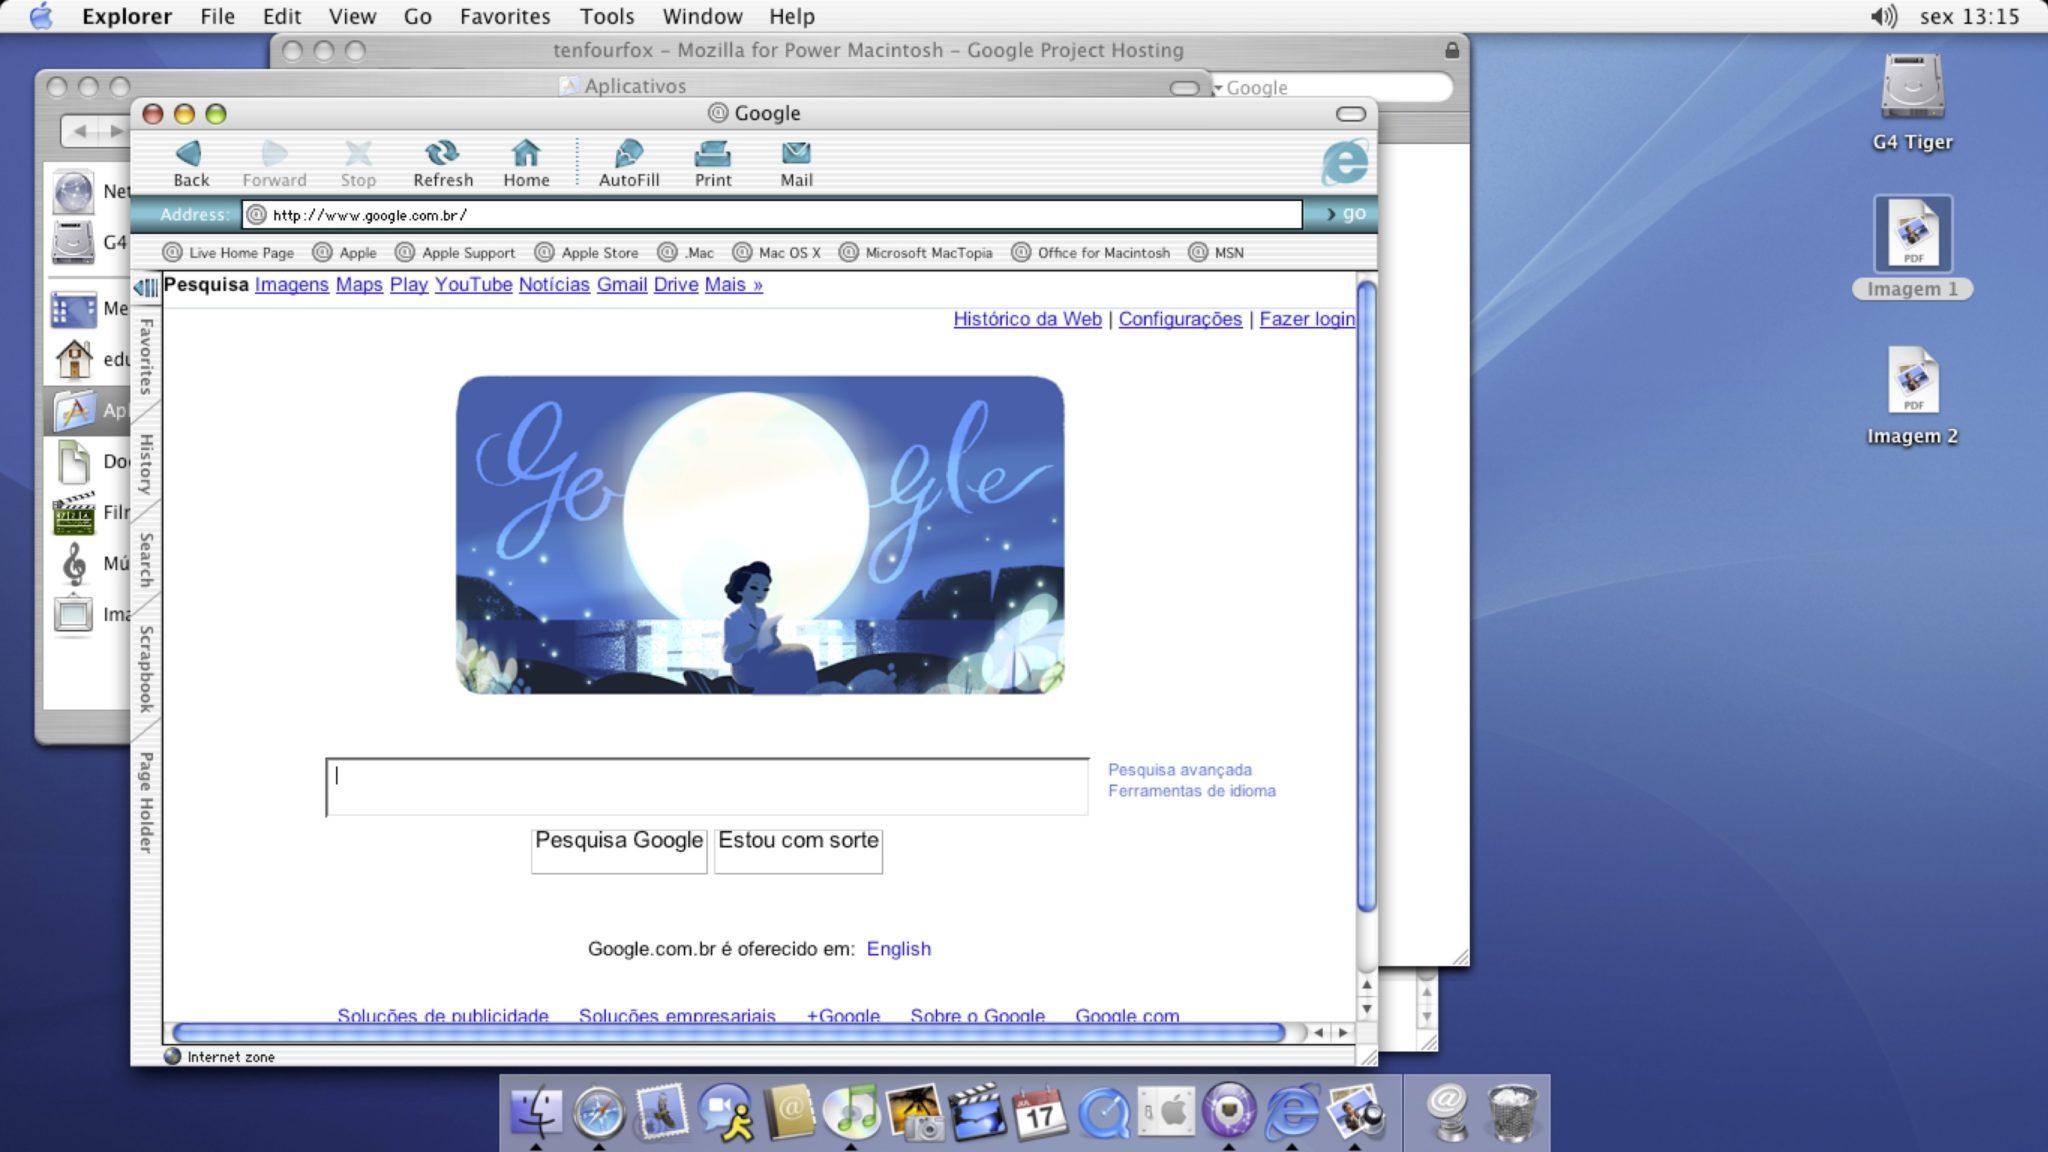 Internet Explorer bežiaci na Mac OS X Panther. Zdroj: timmerman.wordpress.com